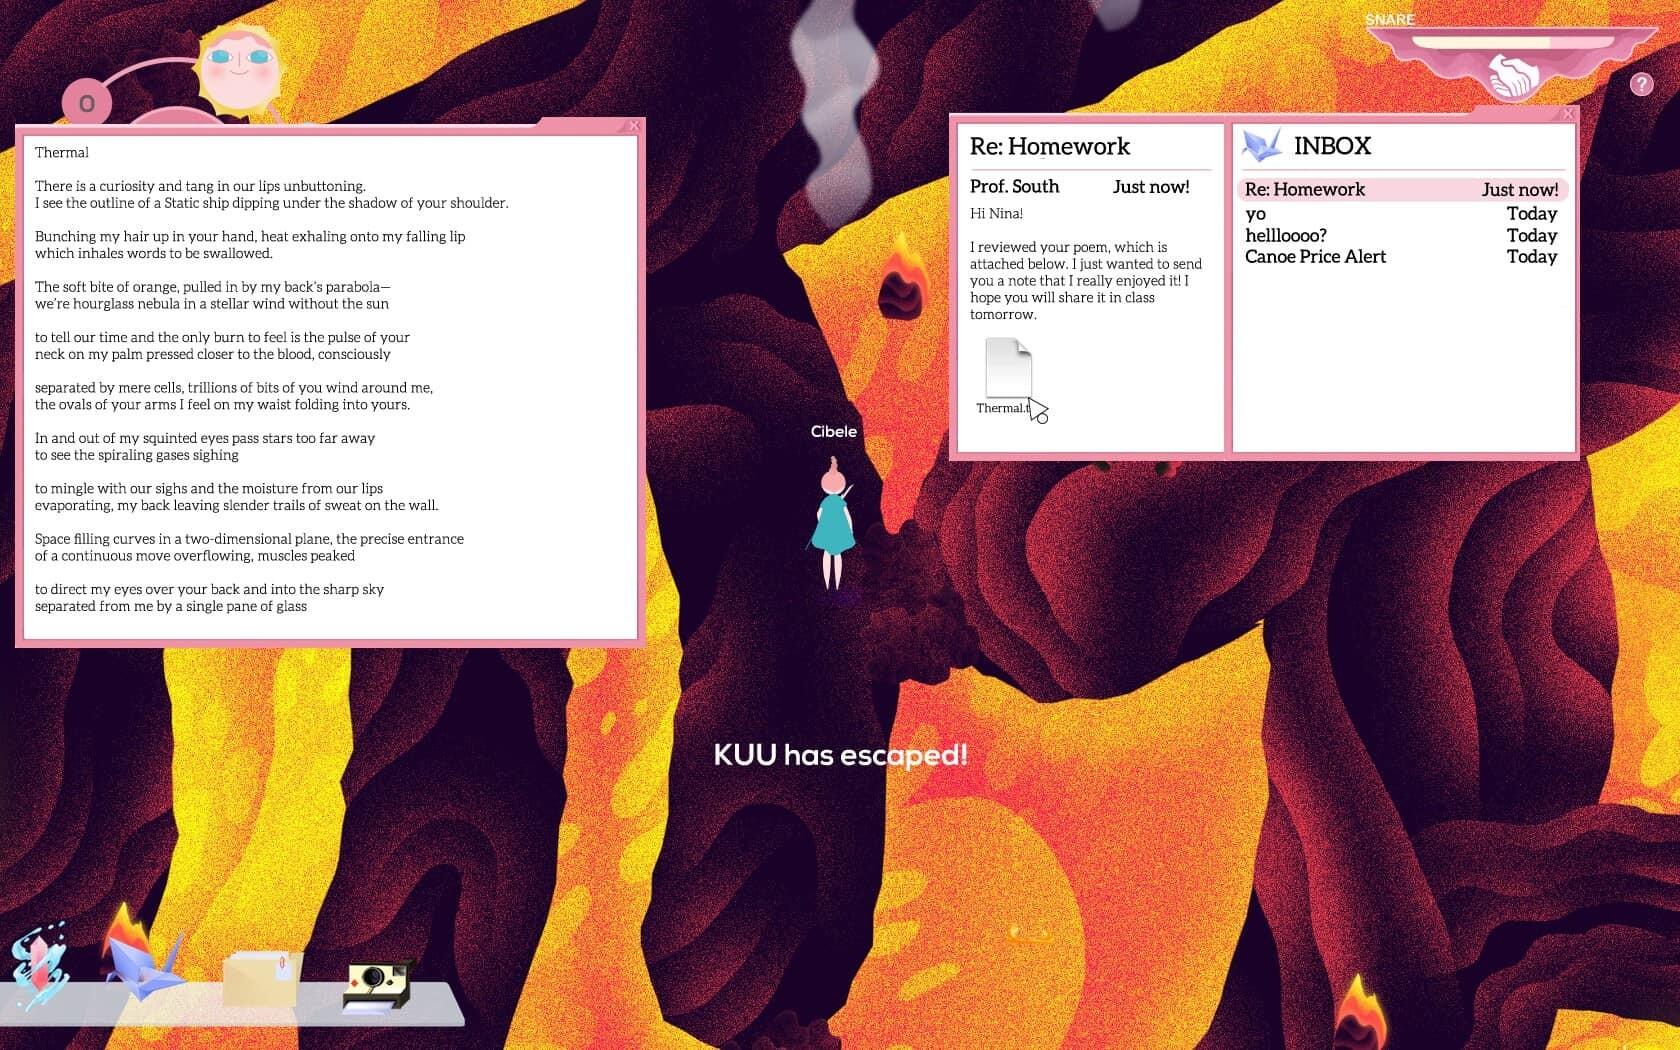 review of Cibele - third act screenshot